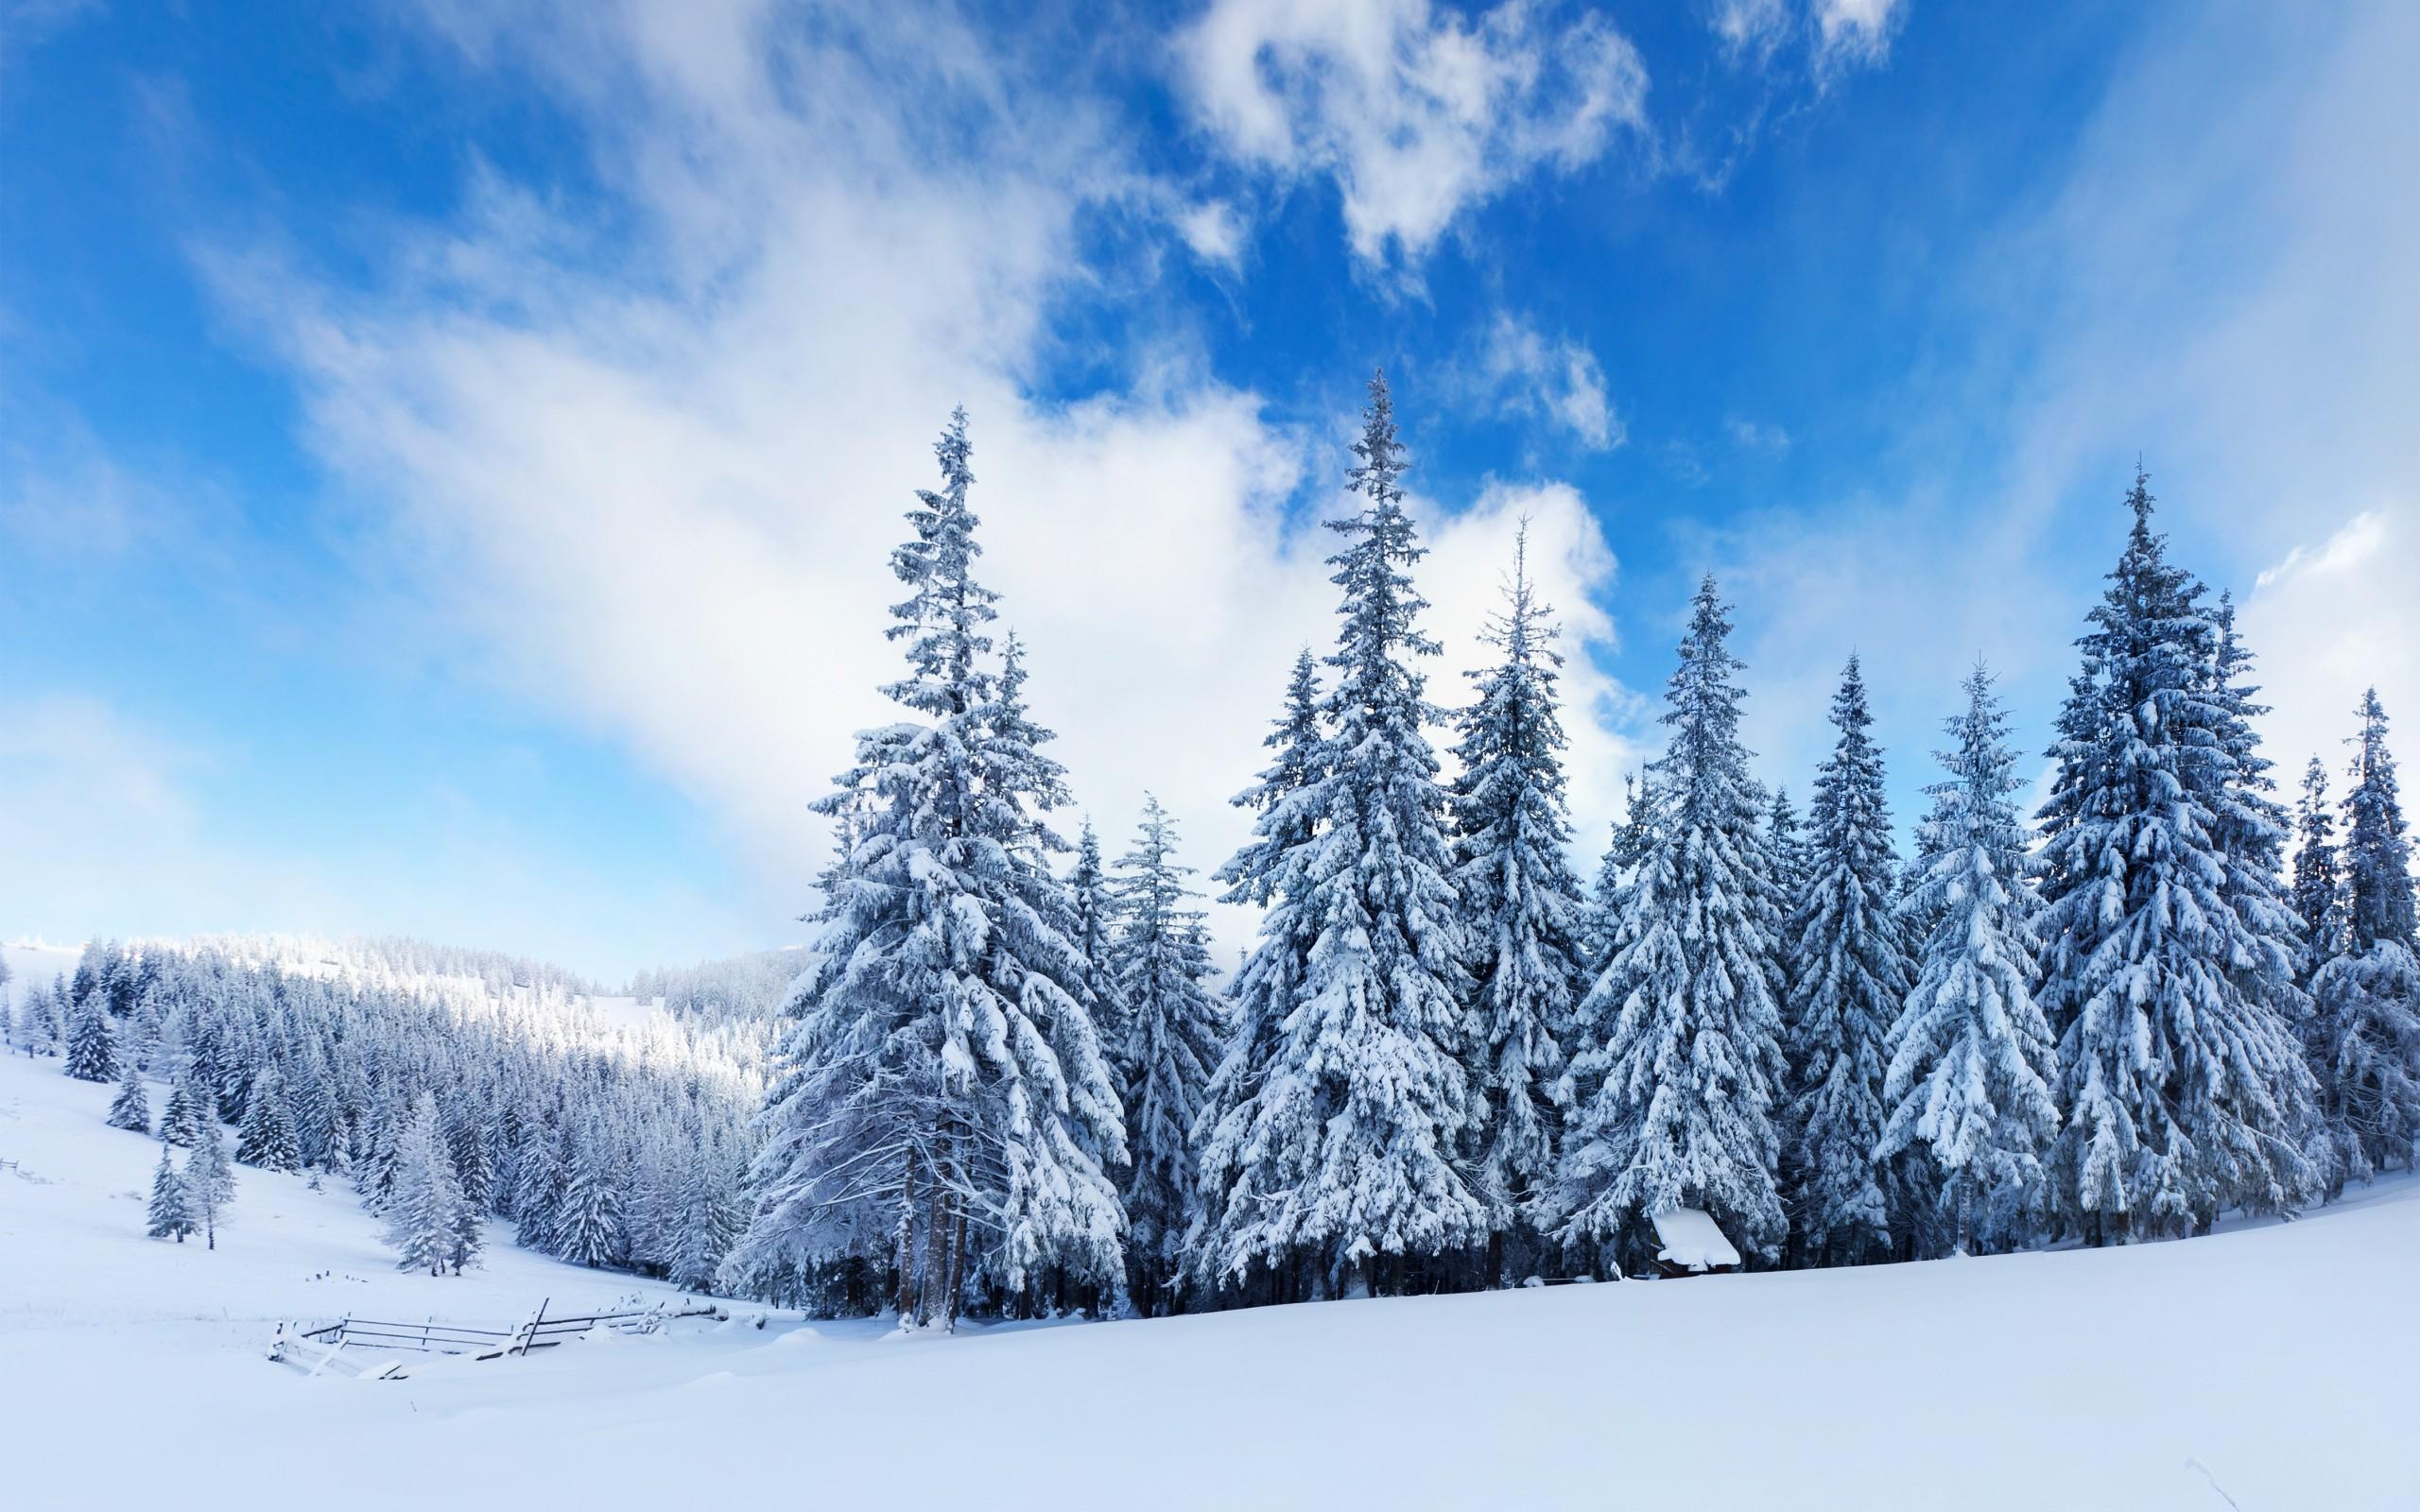 Snowy Trees Landscape